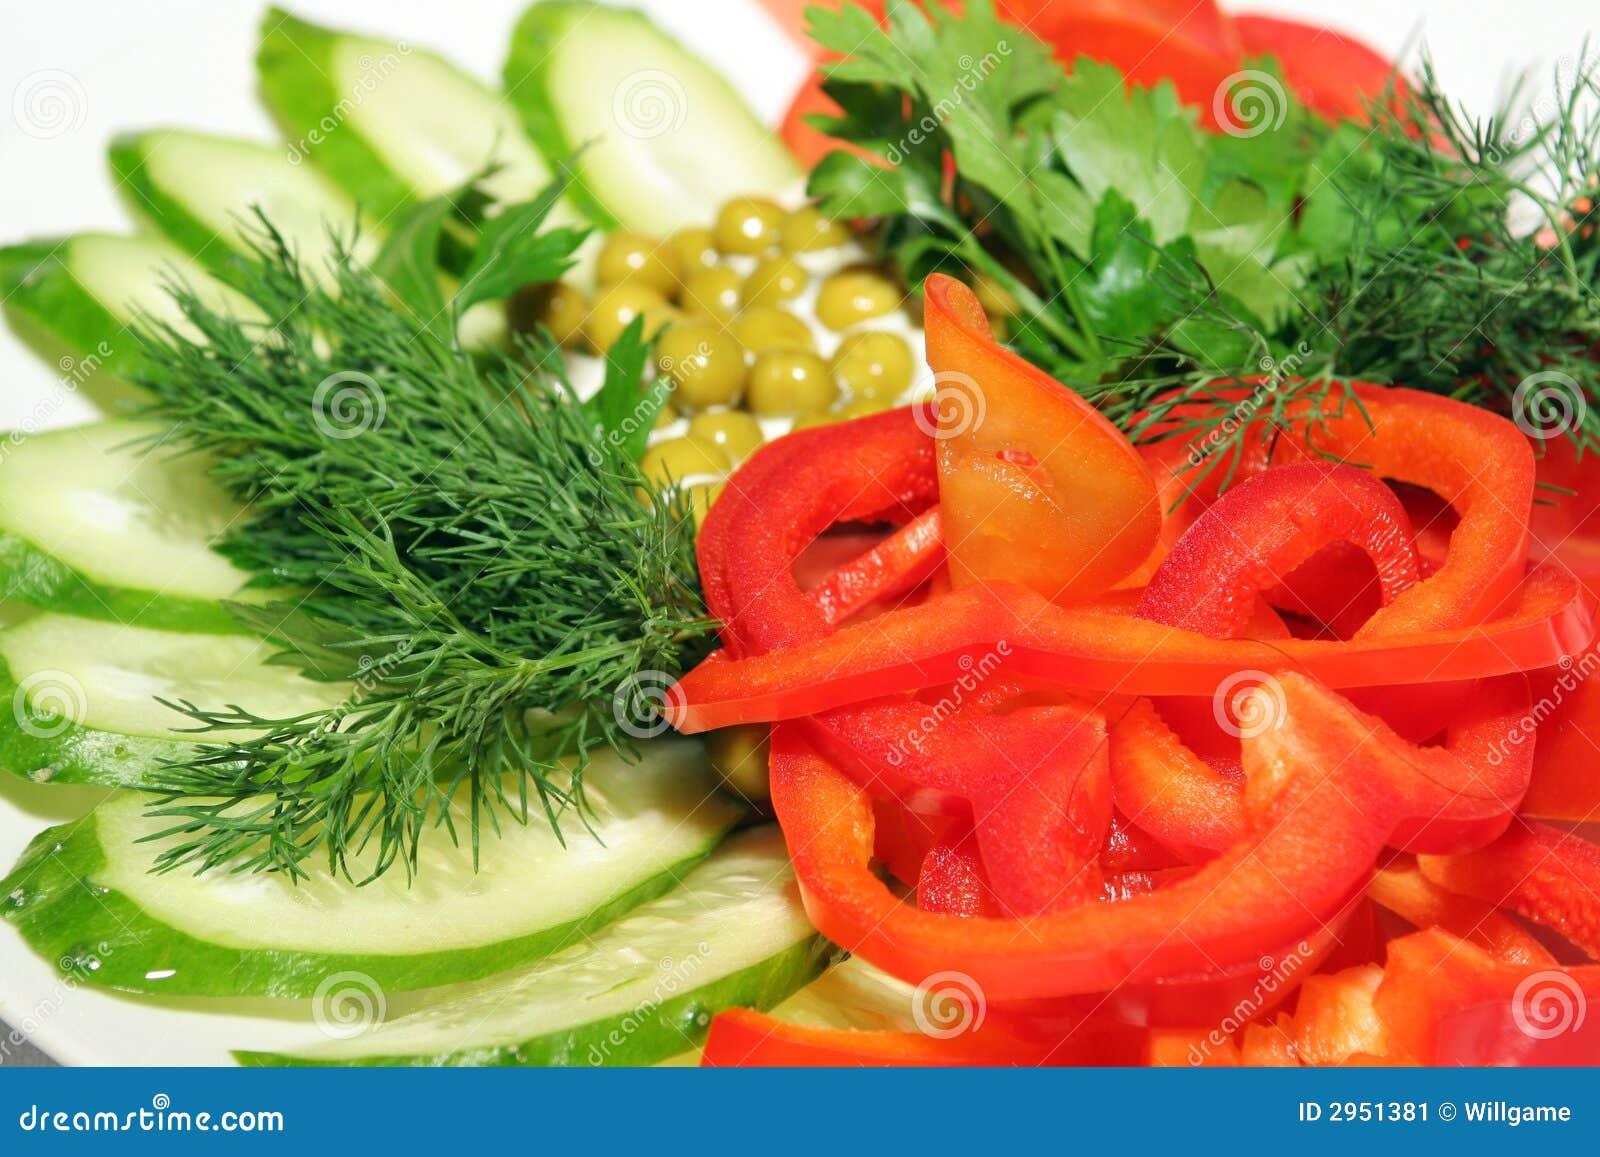 plato de verduras frescas imagen de archivo imagen 2951381